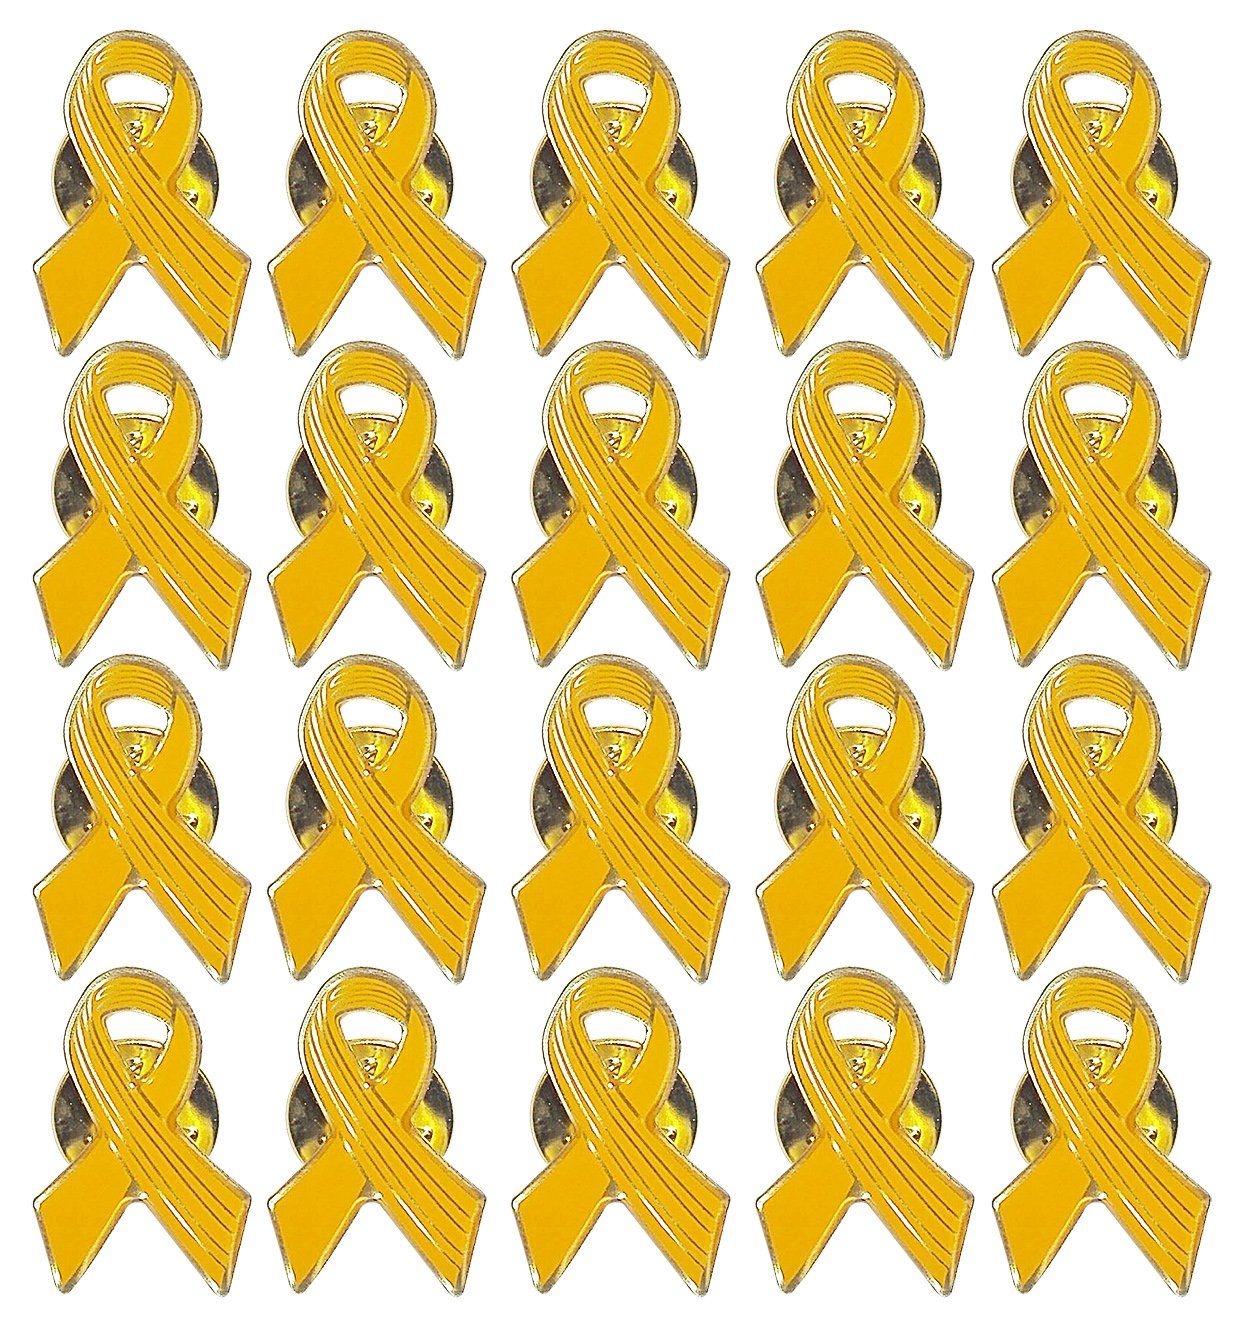 Lot of 20 - Yellow Awareness Ribbon Lapel Pins - Enamel On Gold Tone Metal. by Tom David Lewis